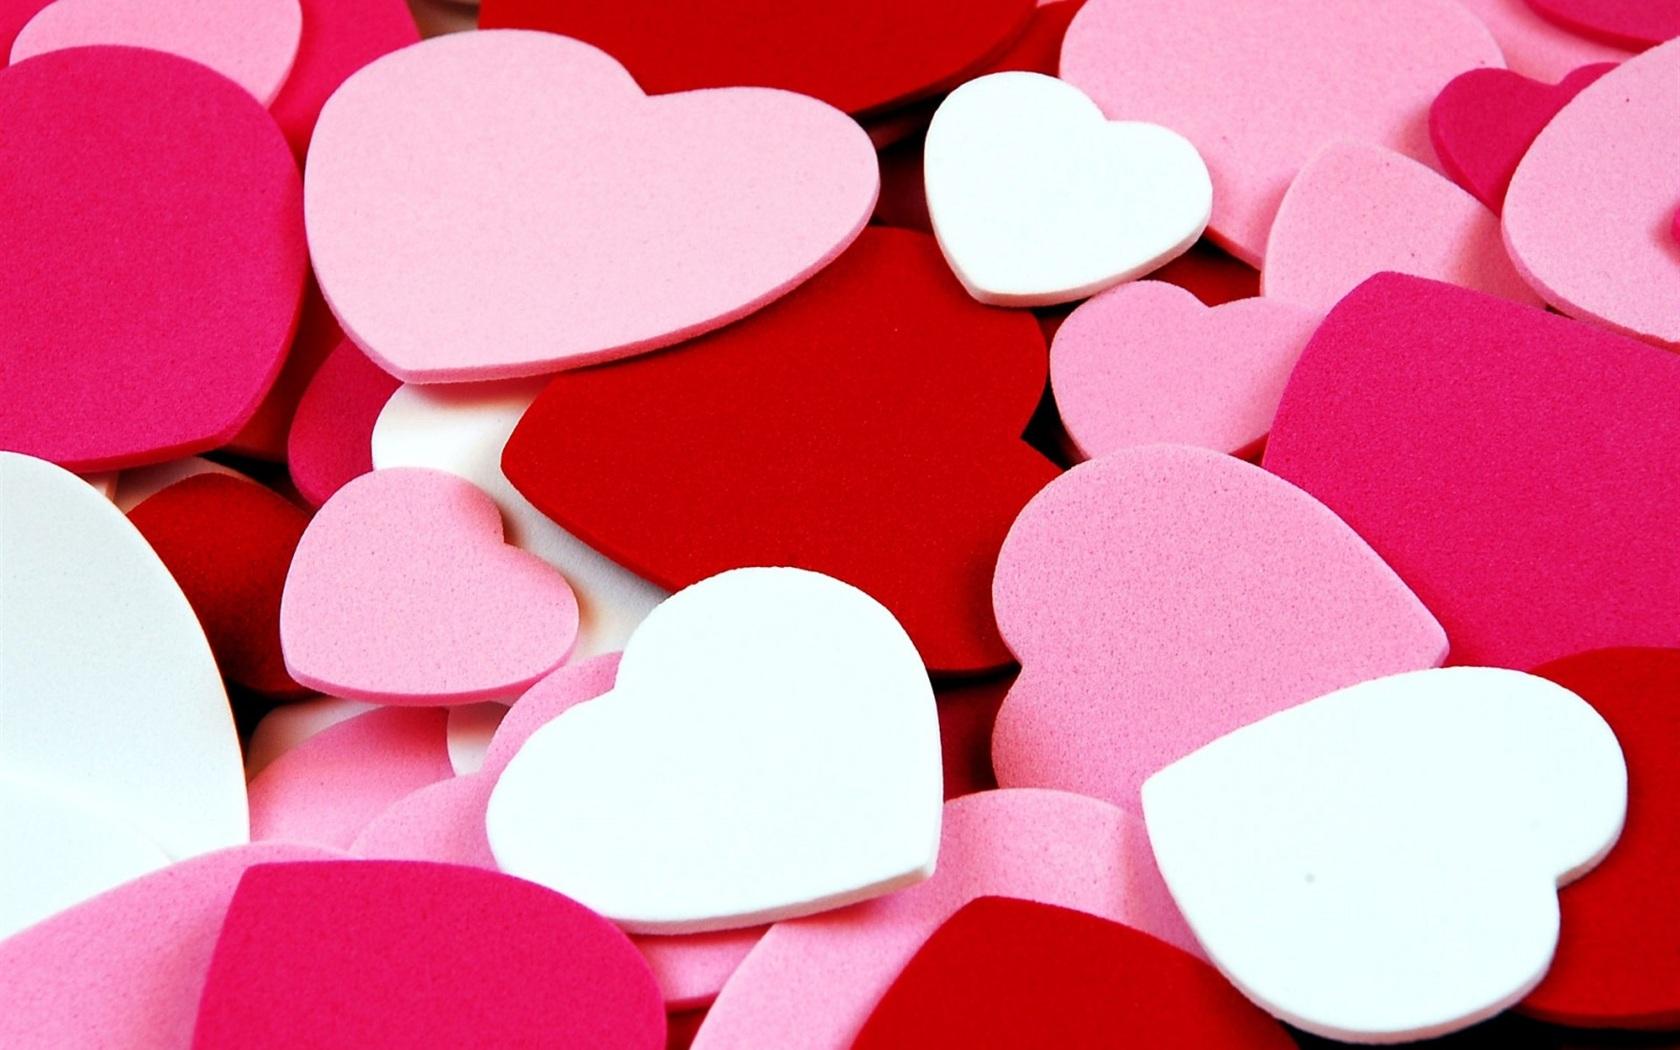 Wallpaper Love Heart-shaped Background 1600x1200 HD